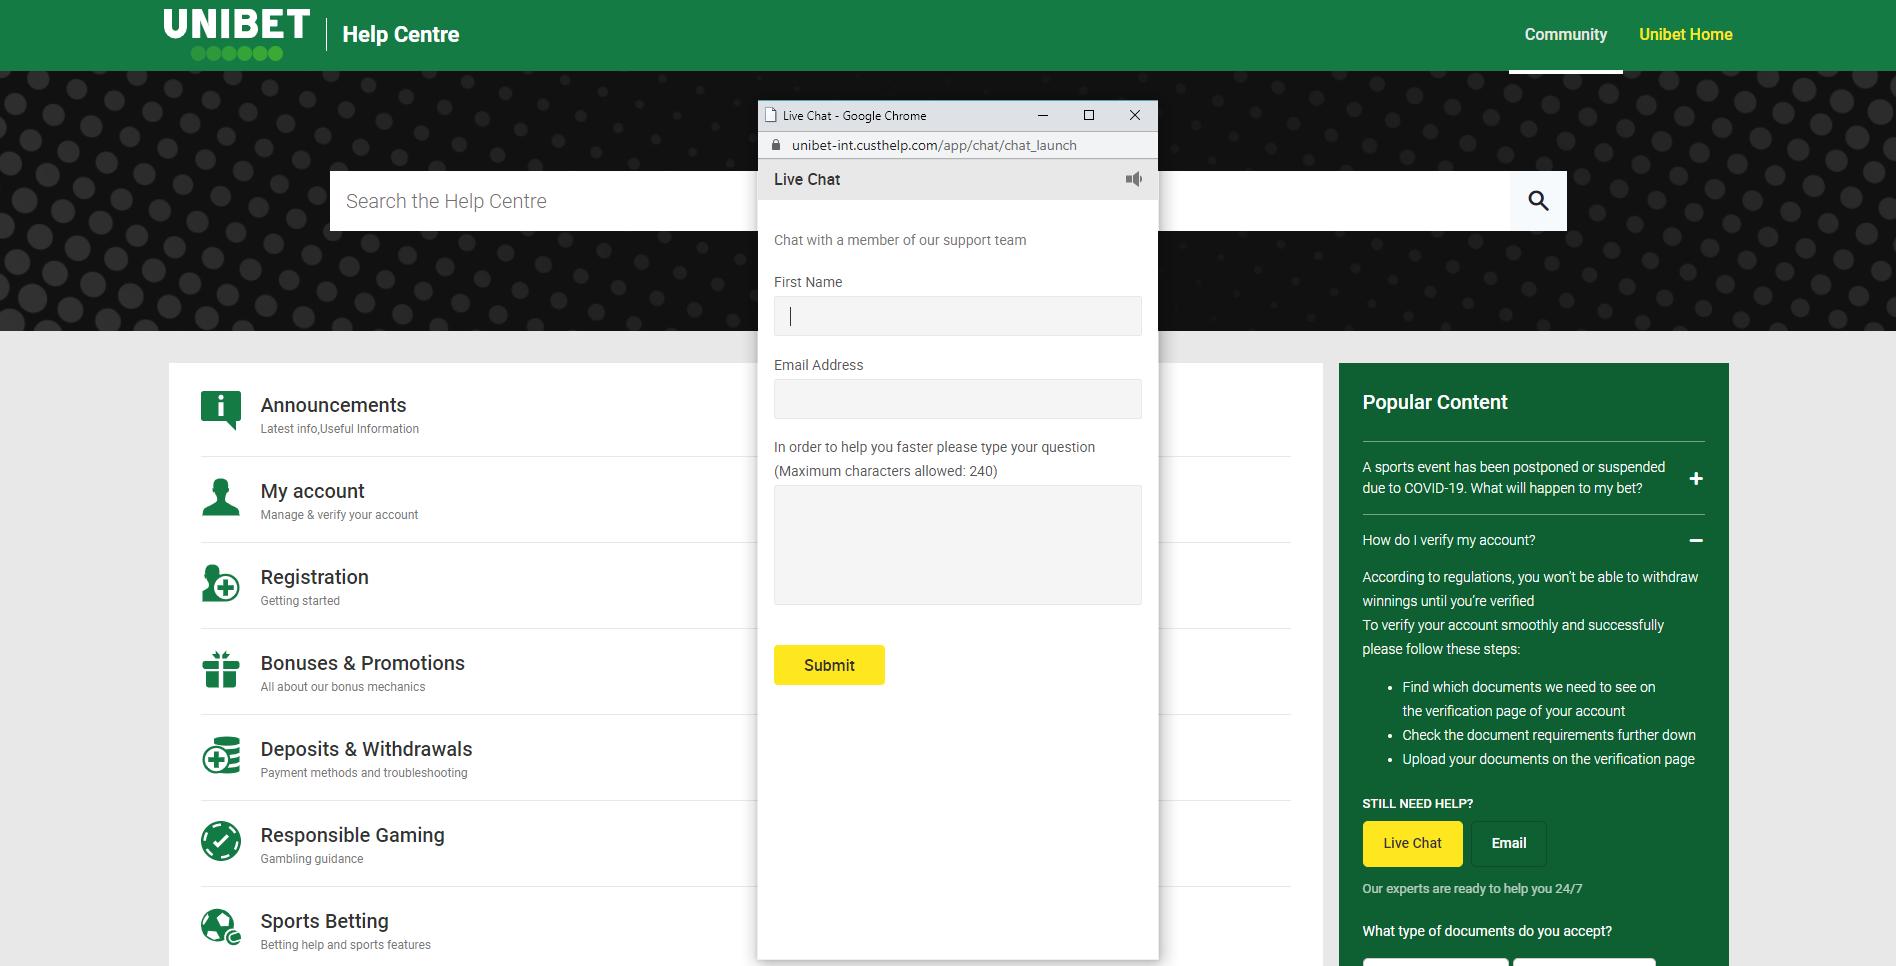 unibet live chat klientų aptarnavimo centras community